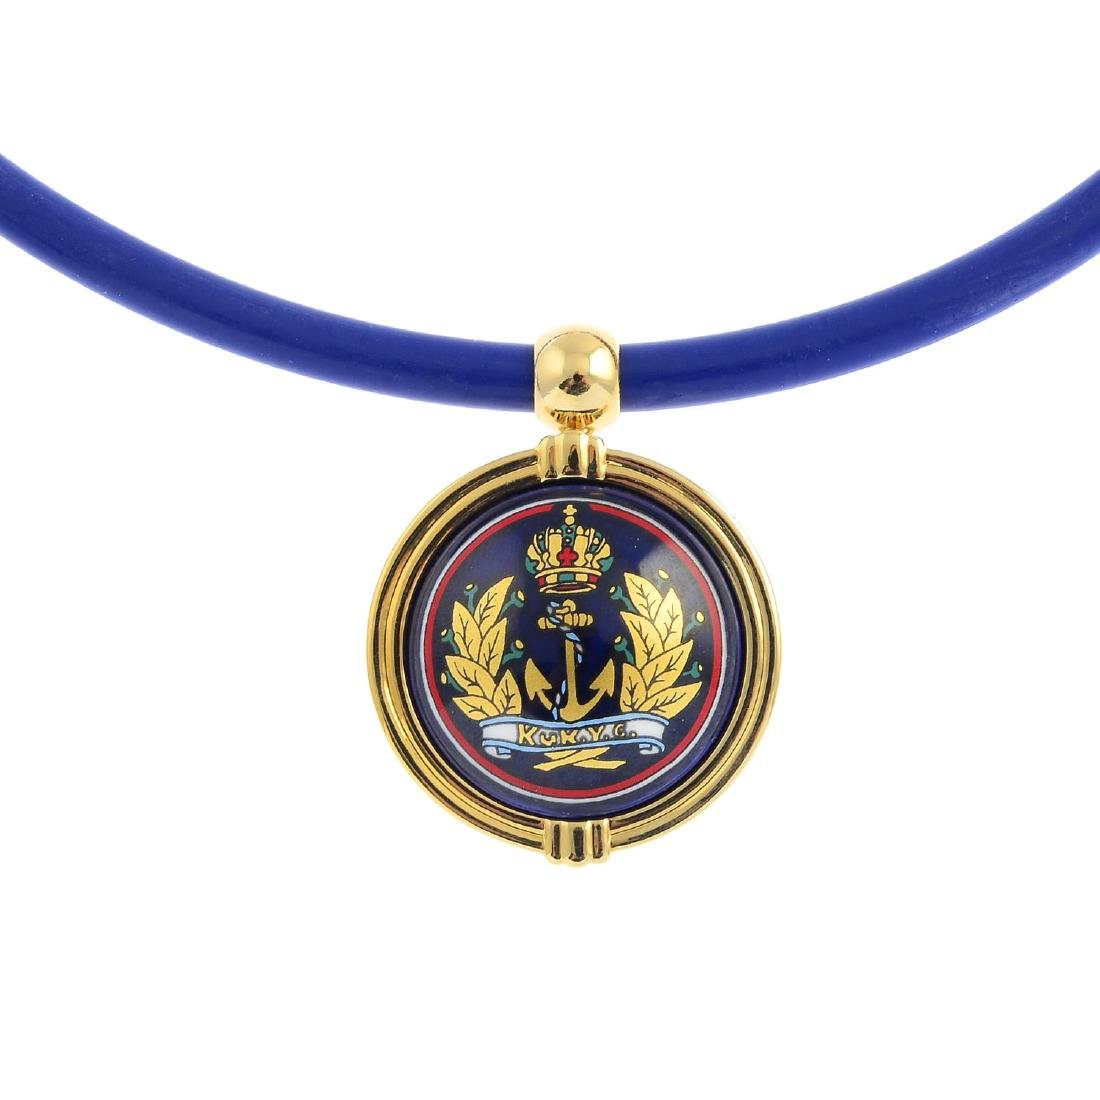 MICHAELA FREY - an enamel pendant. The circular enamel